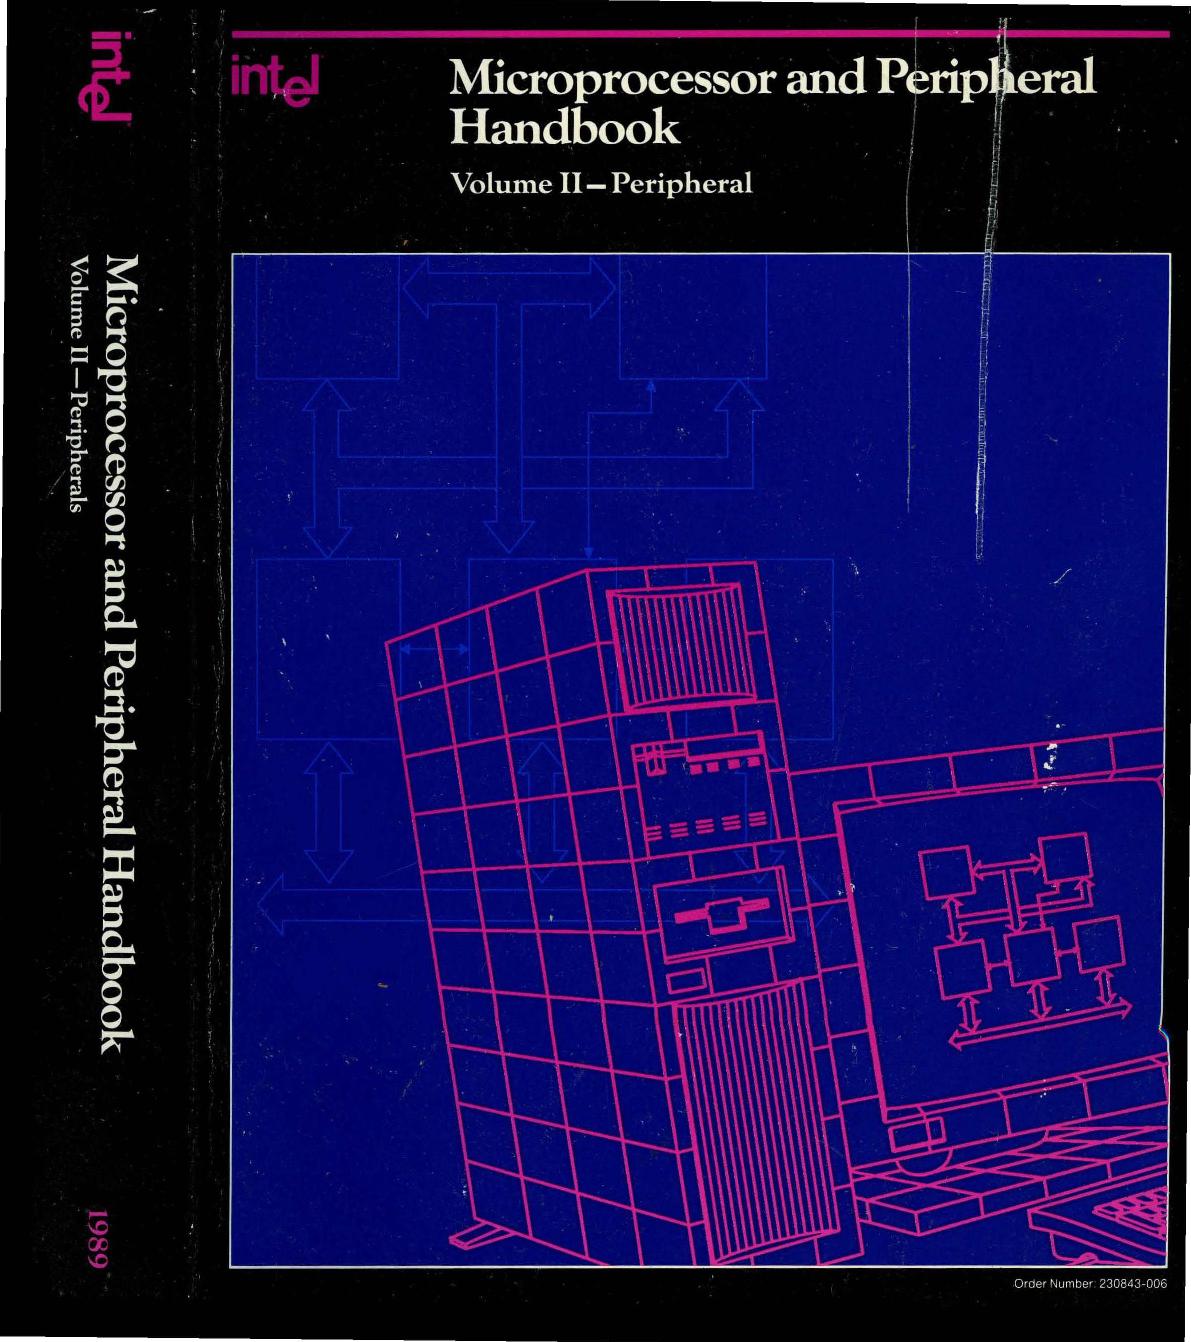 1989_Microprocessor_and_Peripheral_Handbook_Volume_2 1989